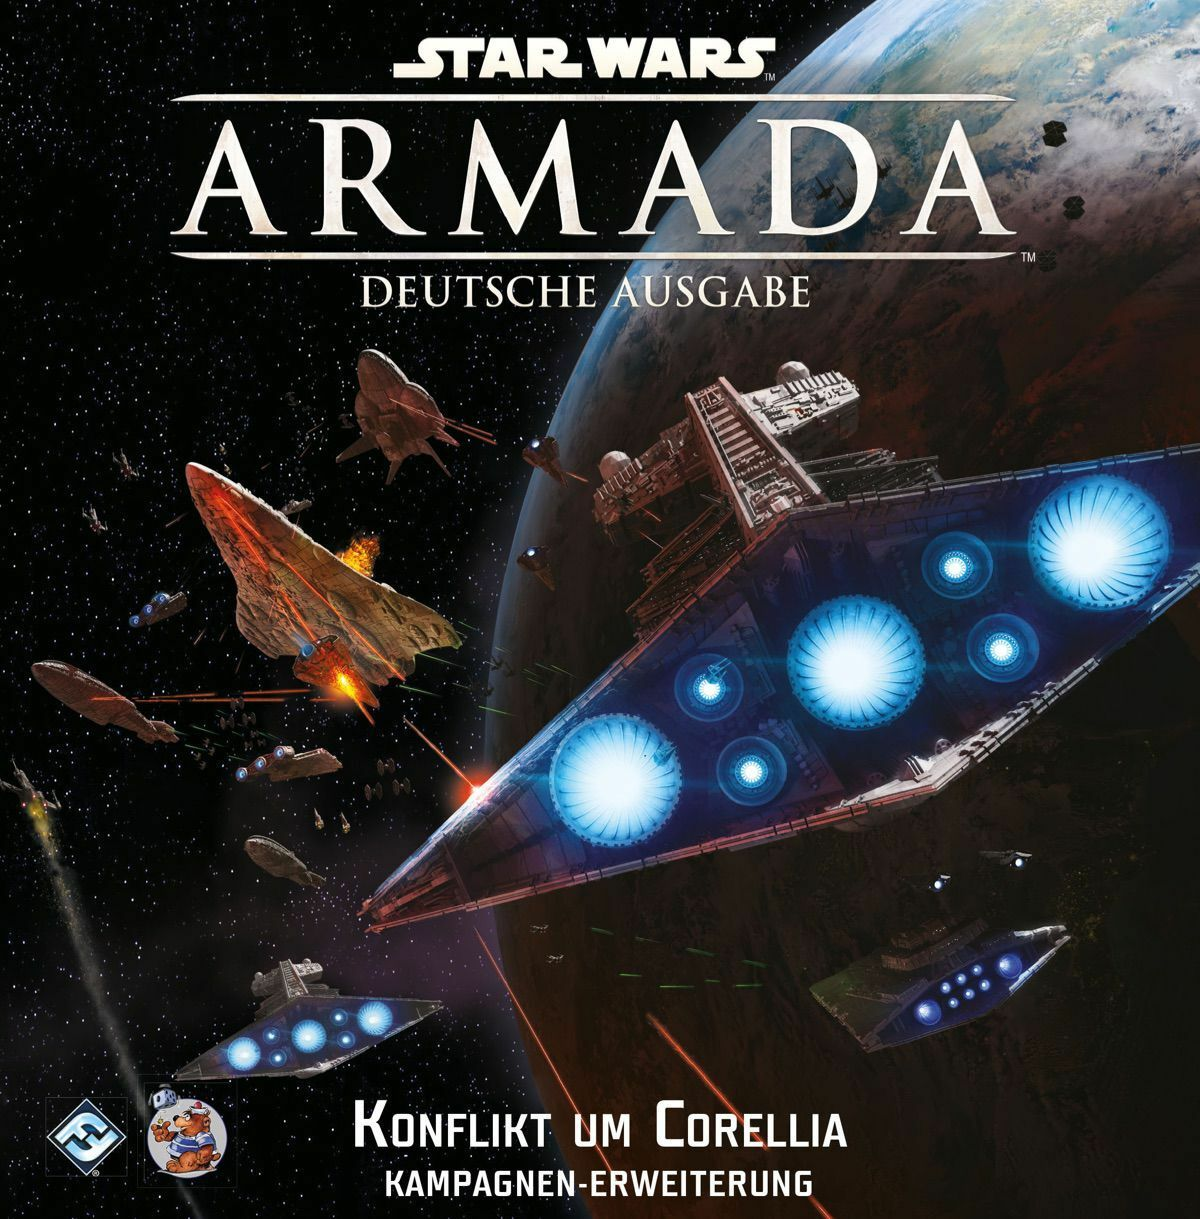 Star Wars Armada Konflikt to Corellia Campaigns Extension (German)